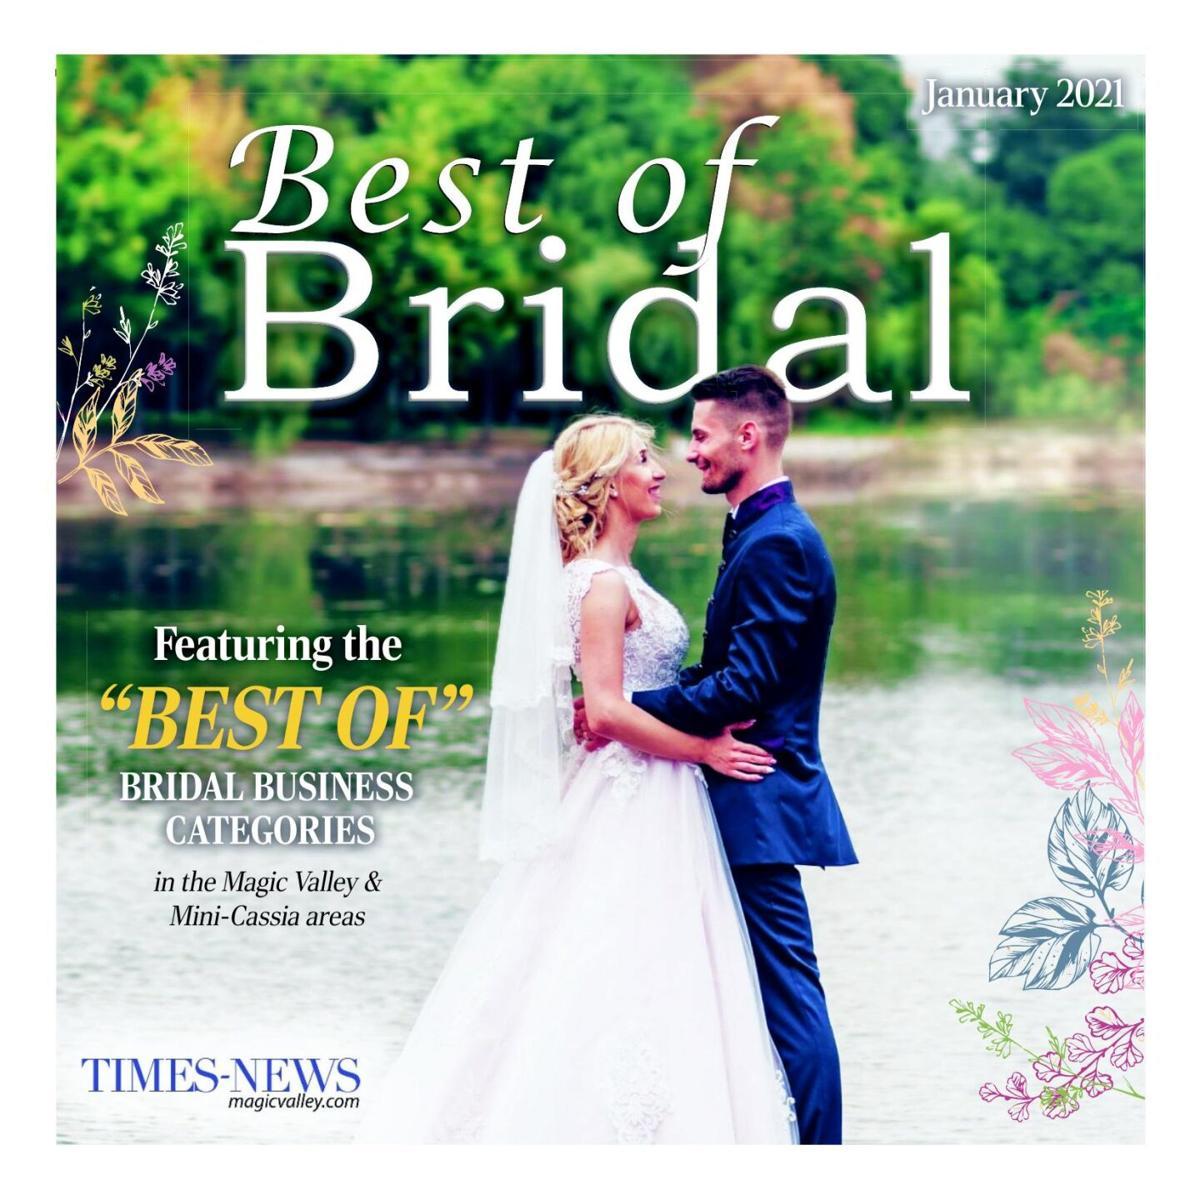 2021 Best Of Bridal